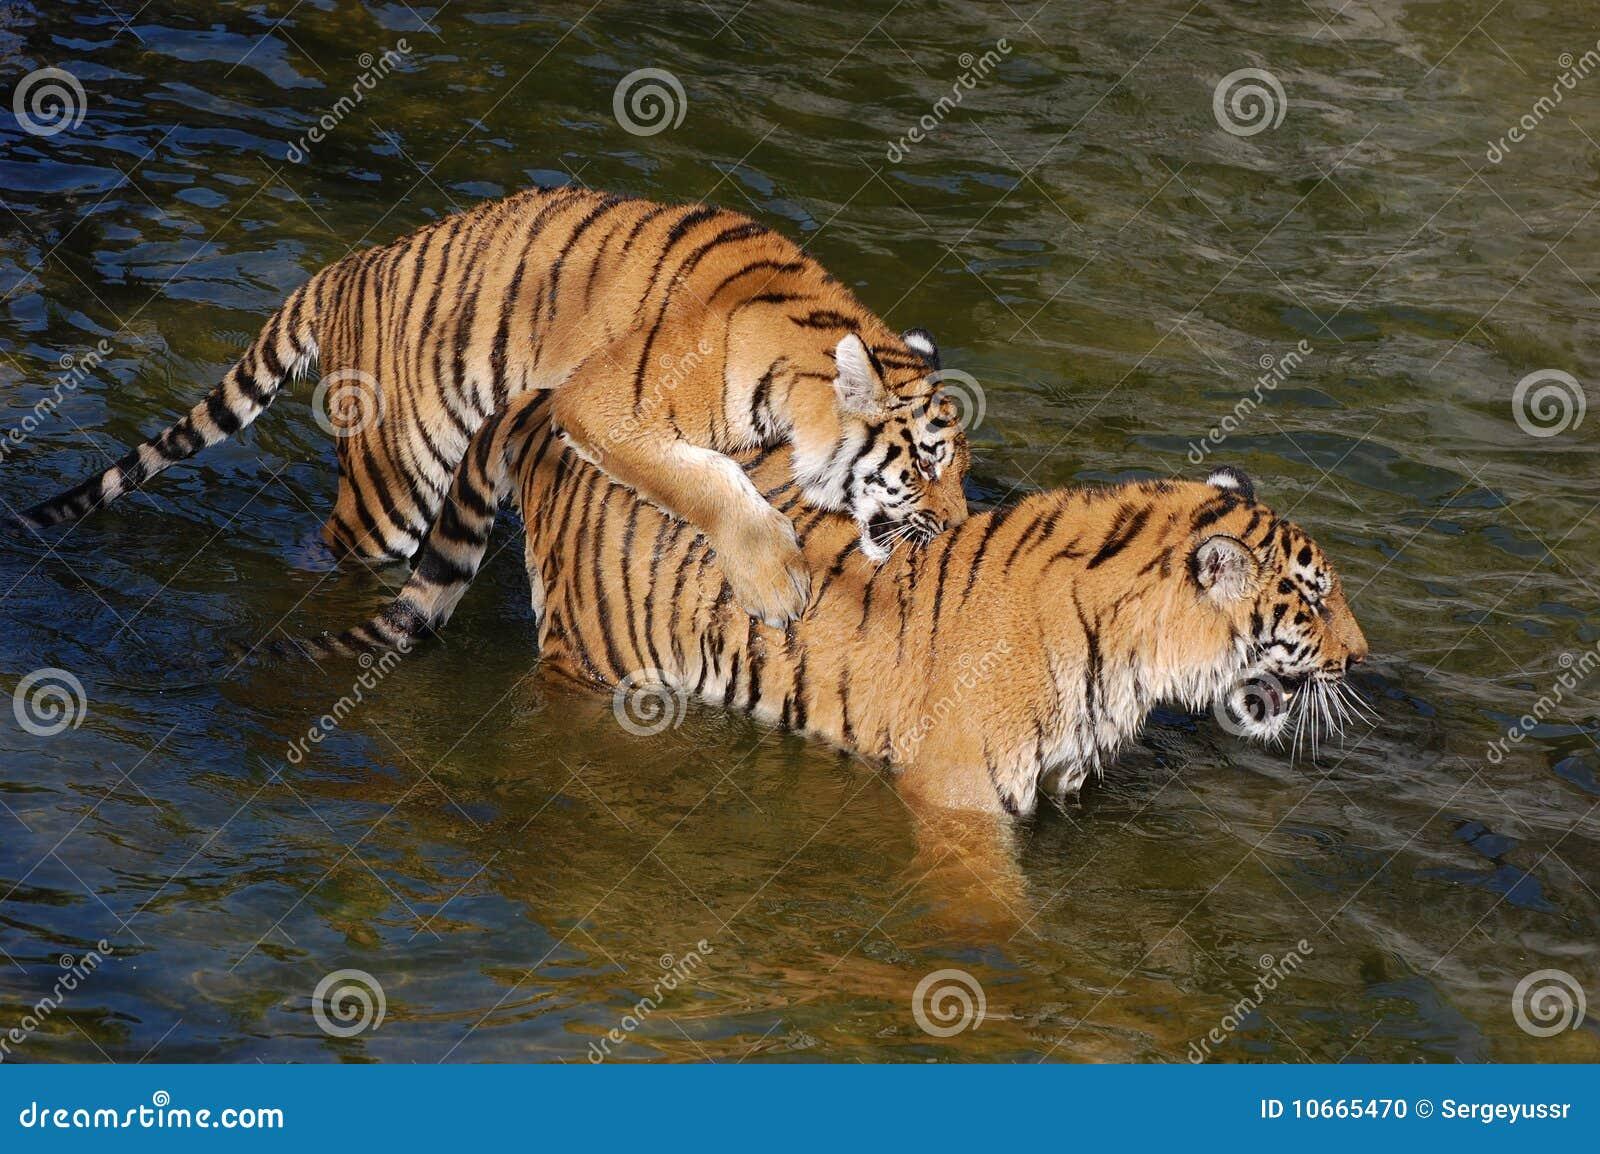 Tigers киев модели веб камера i